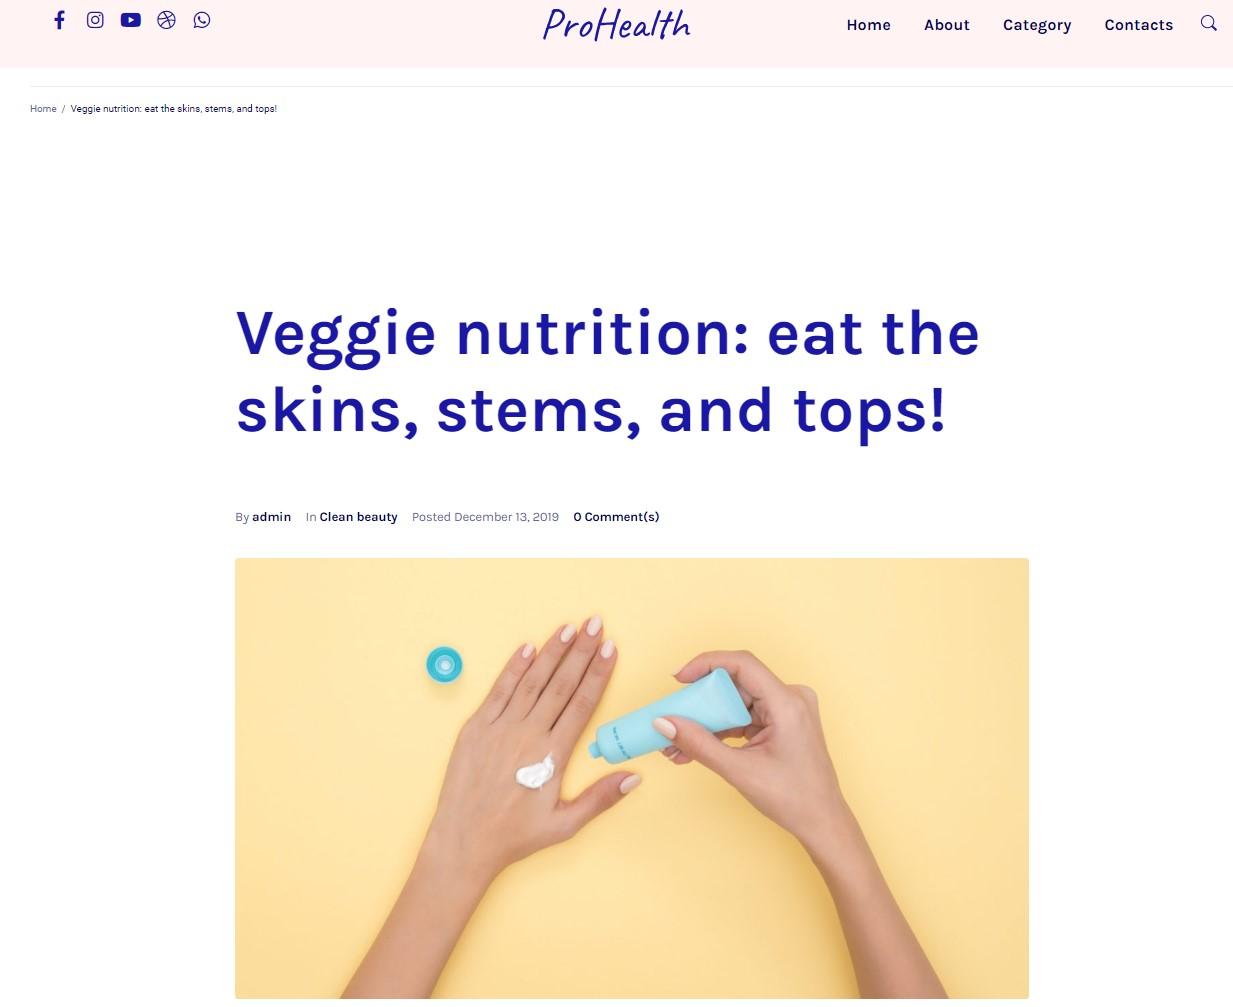 ProHealth website template